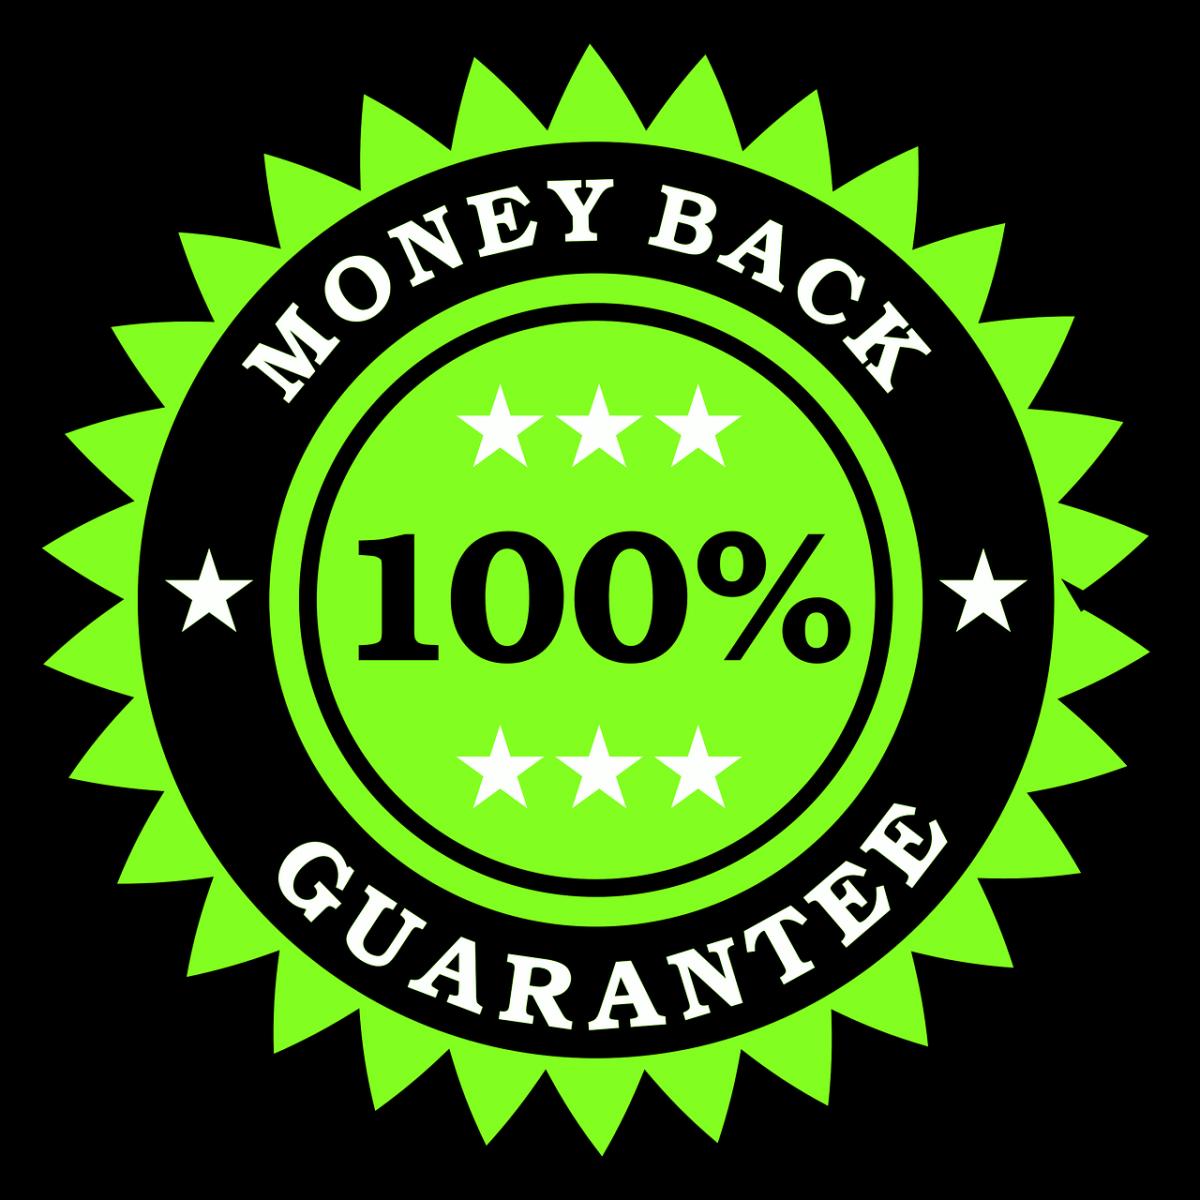 money, back, guarantee